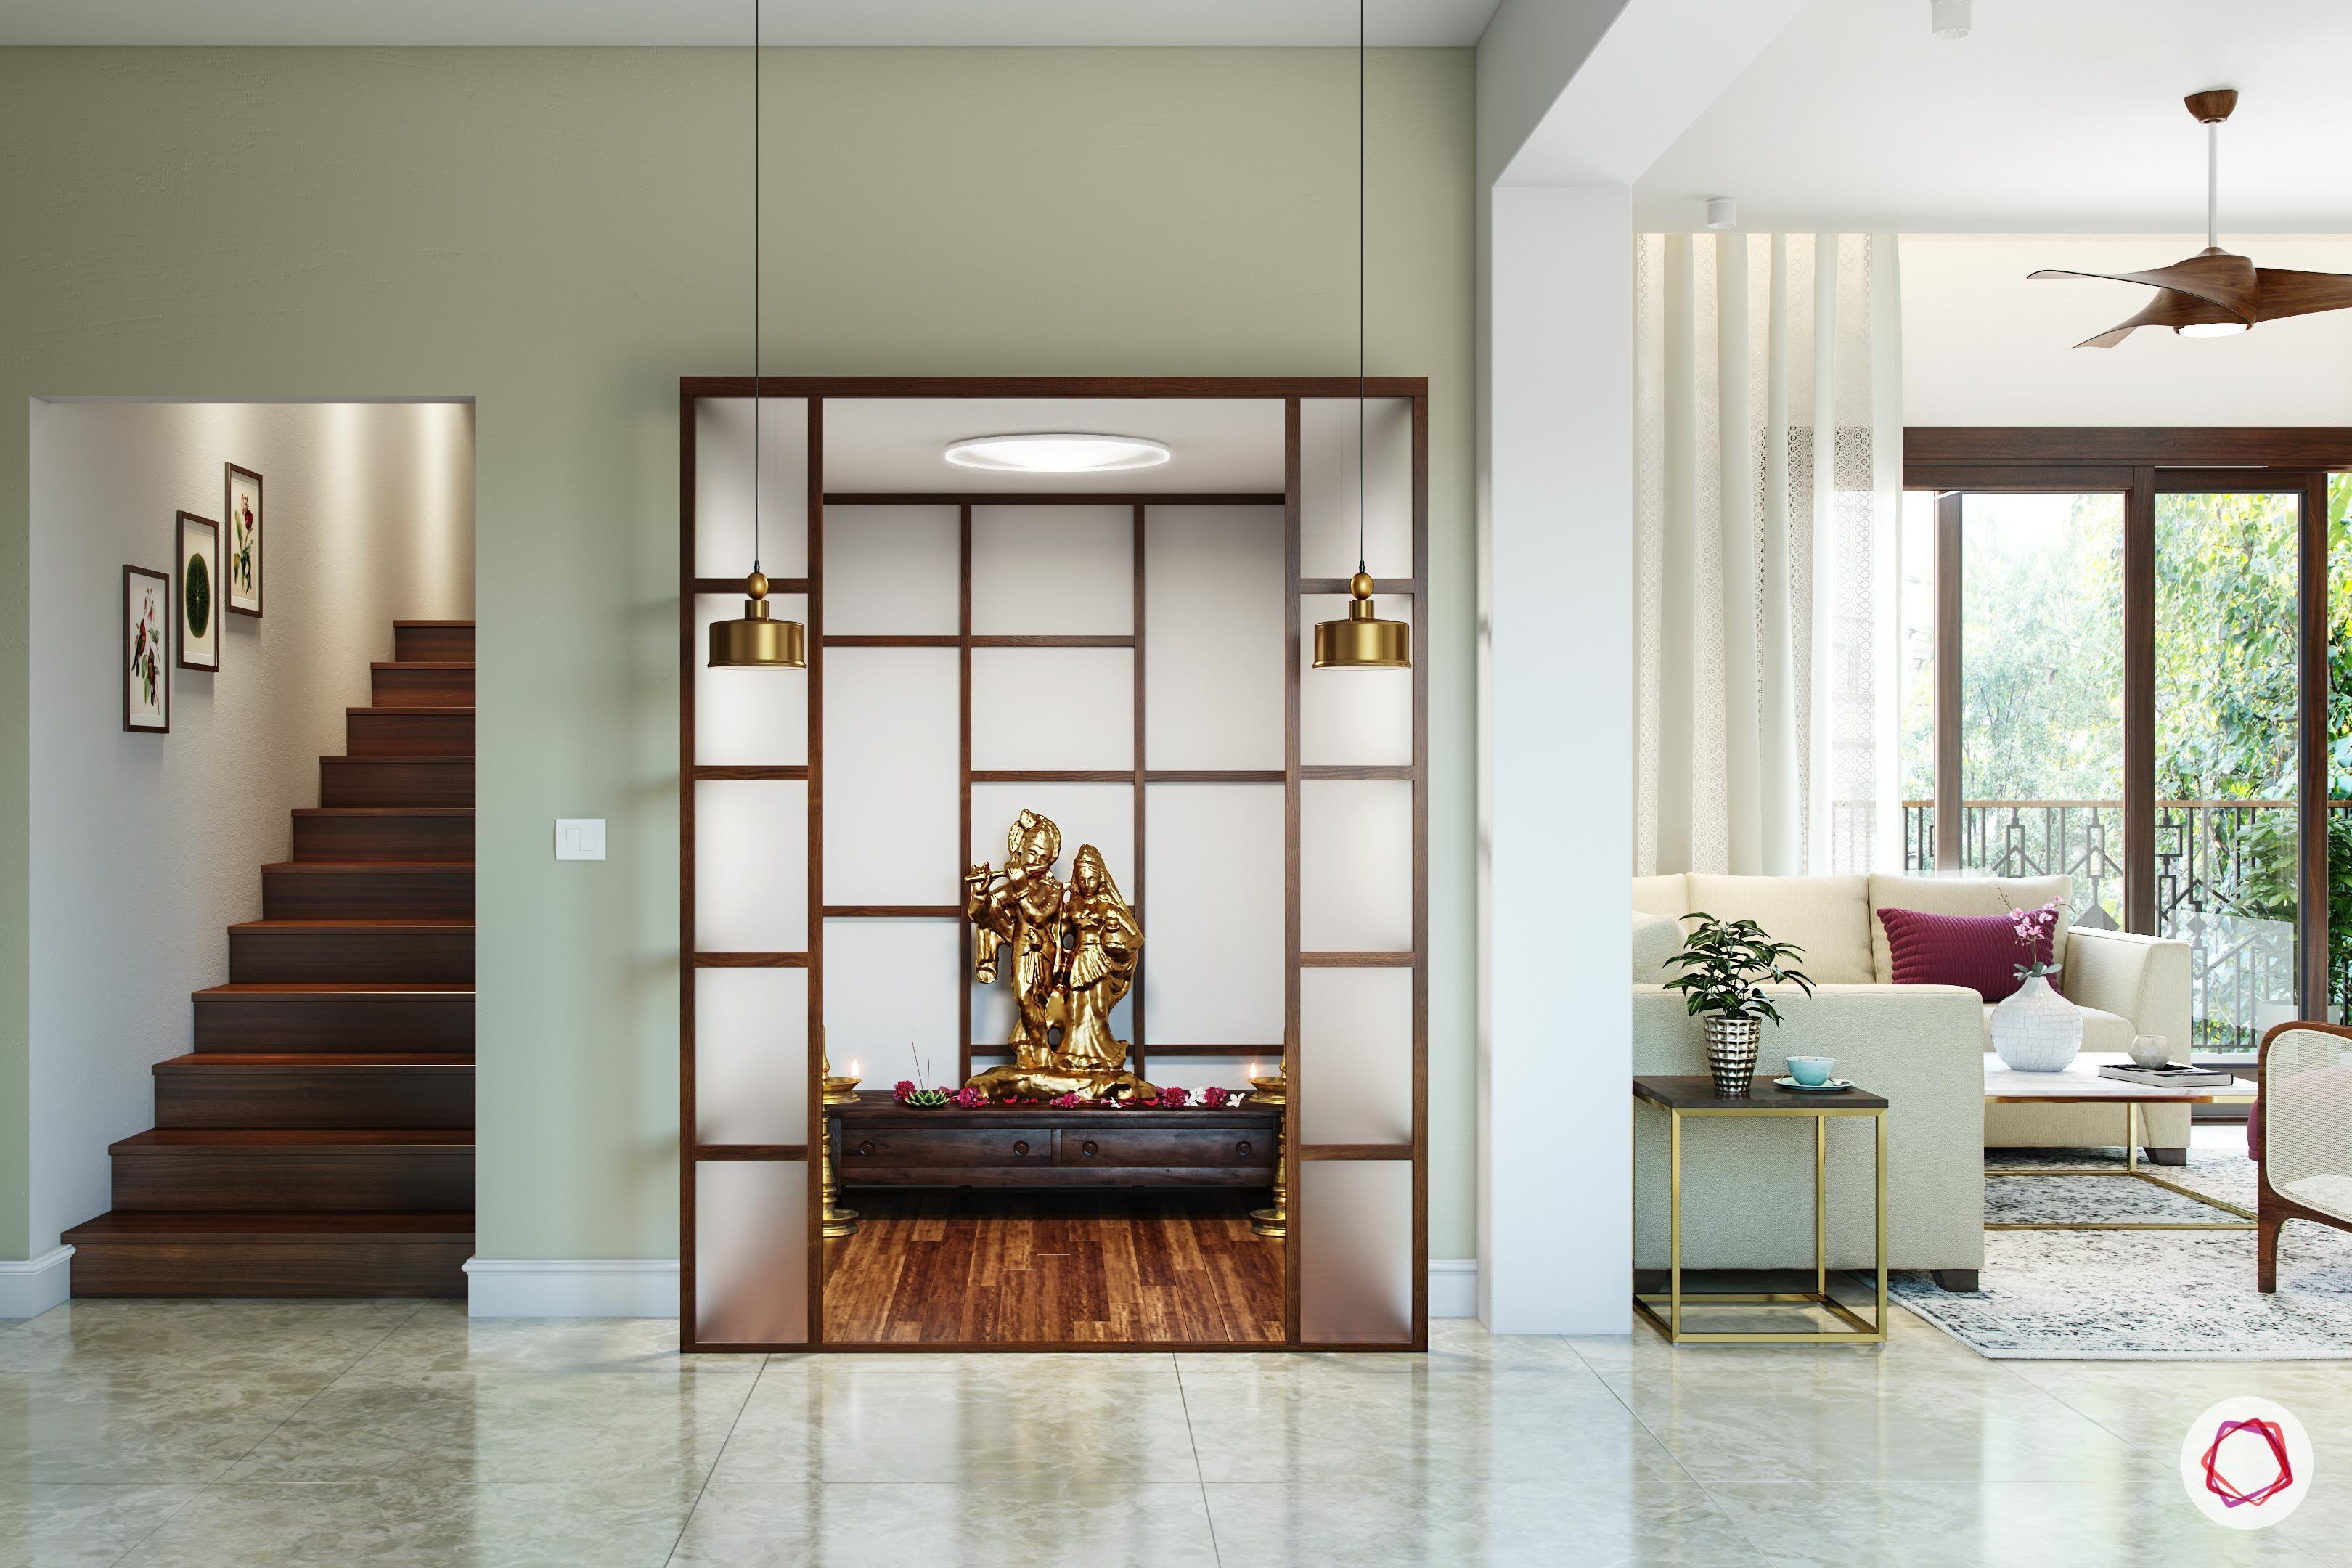 mandir design - frosted glass pooja room